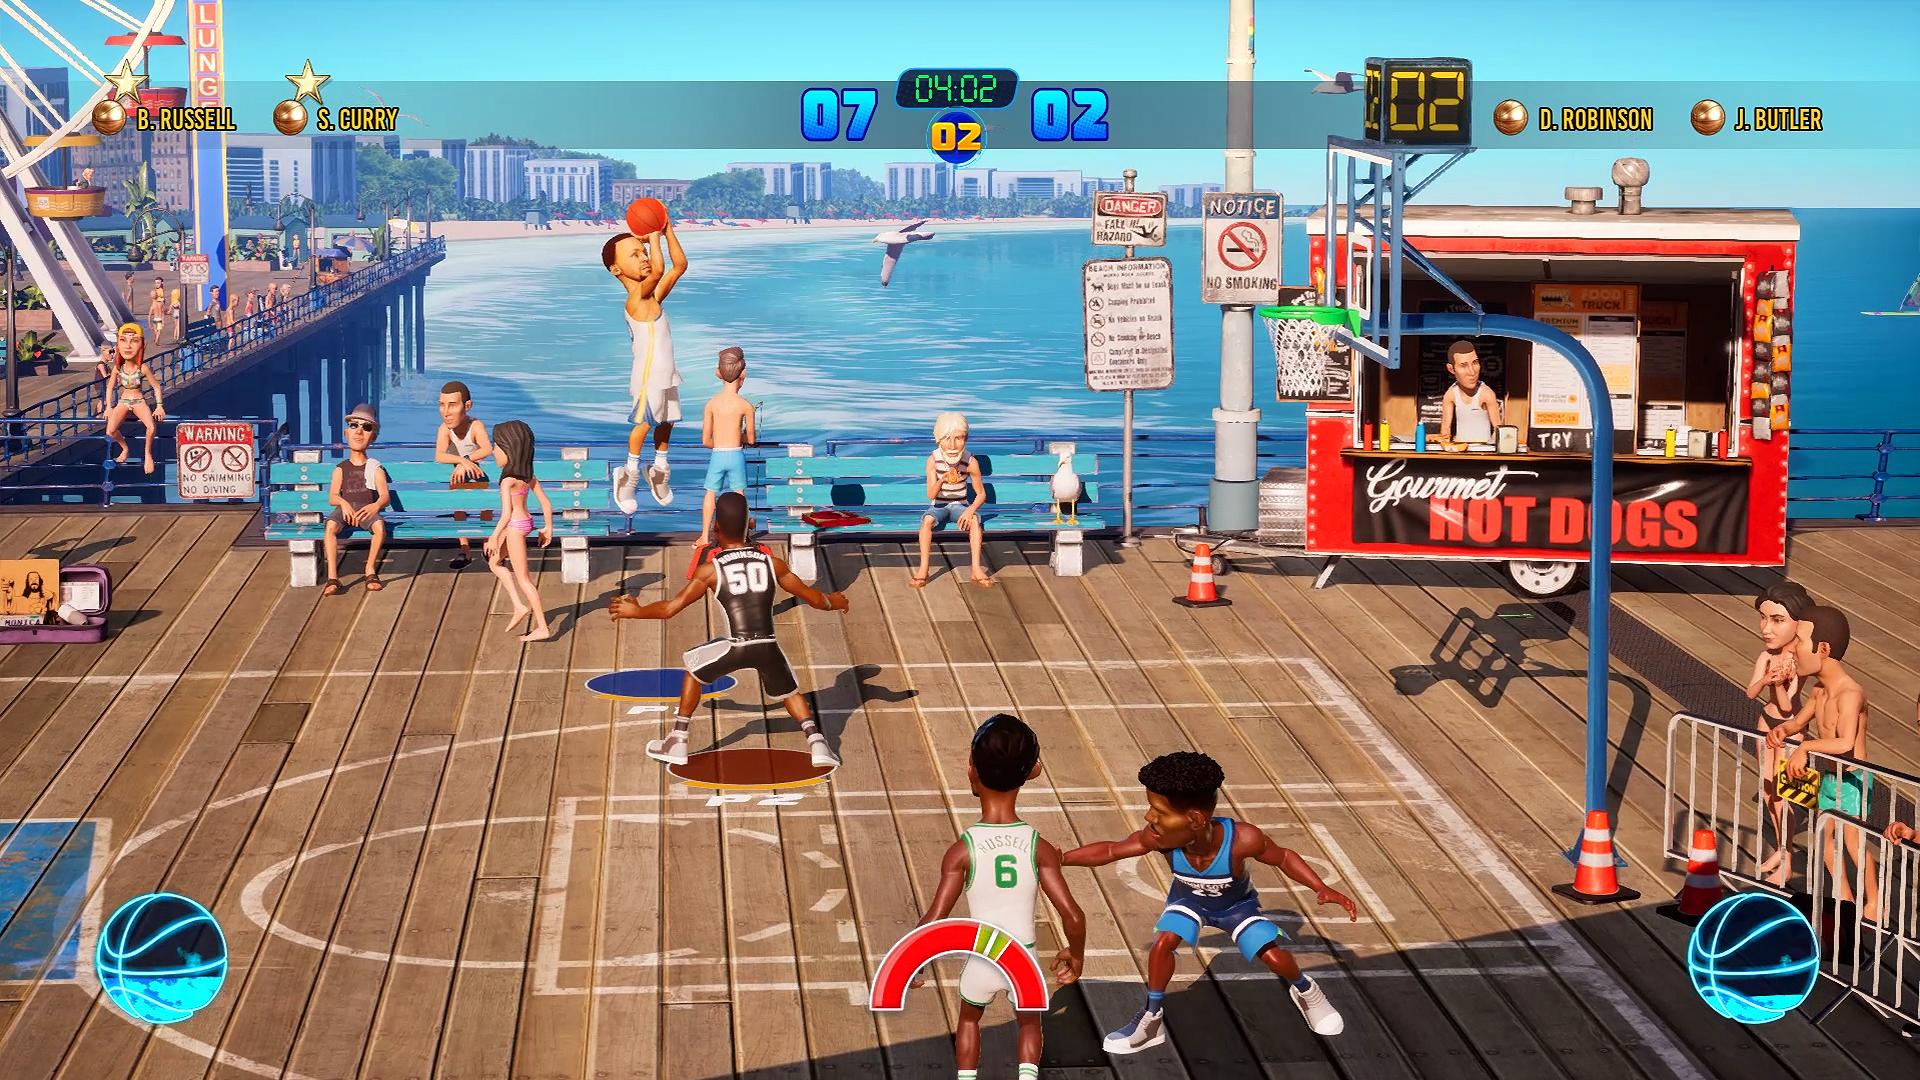 2K anuncia que editará el arcade NBA Playgrounds 2